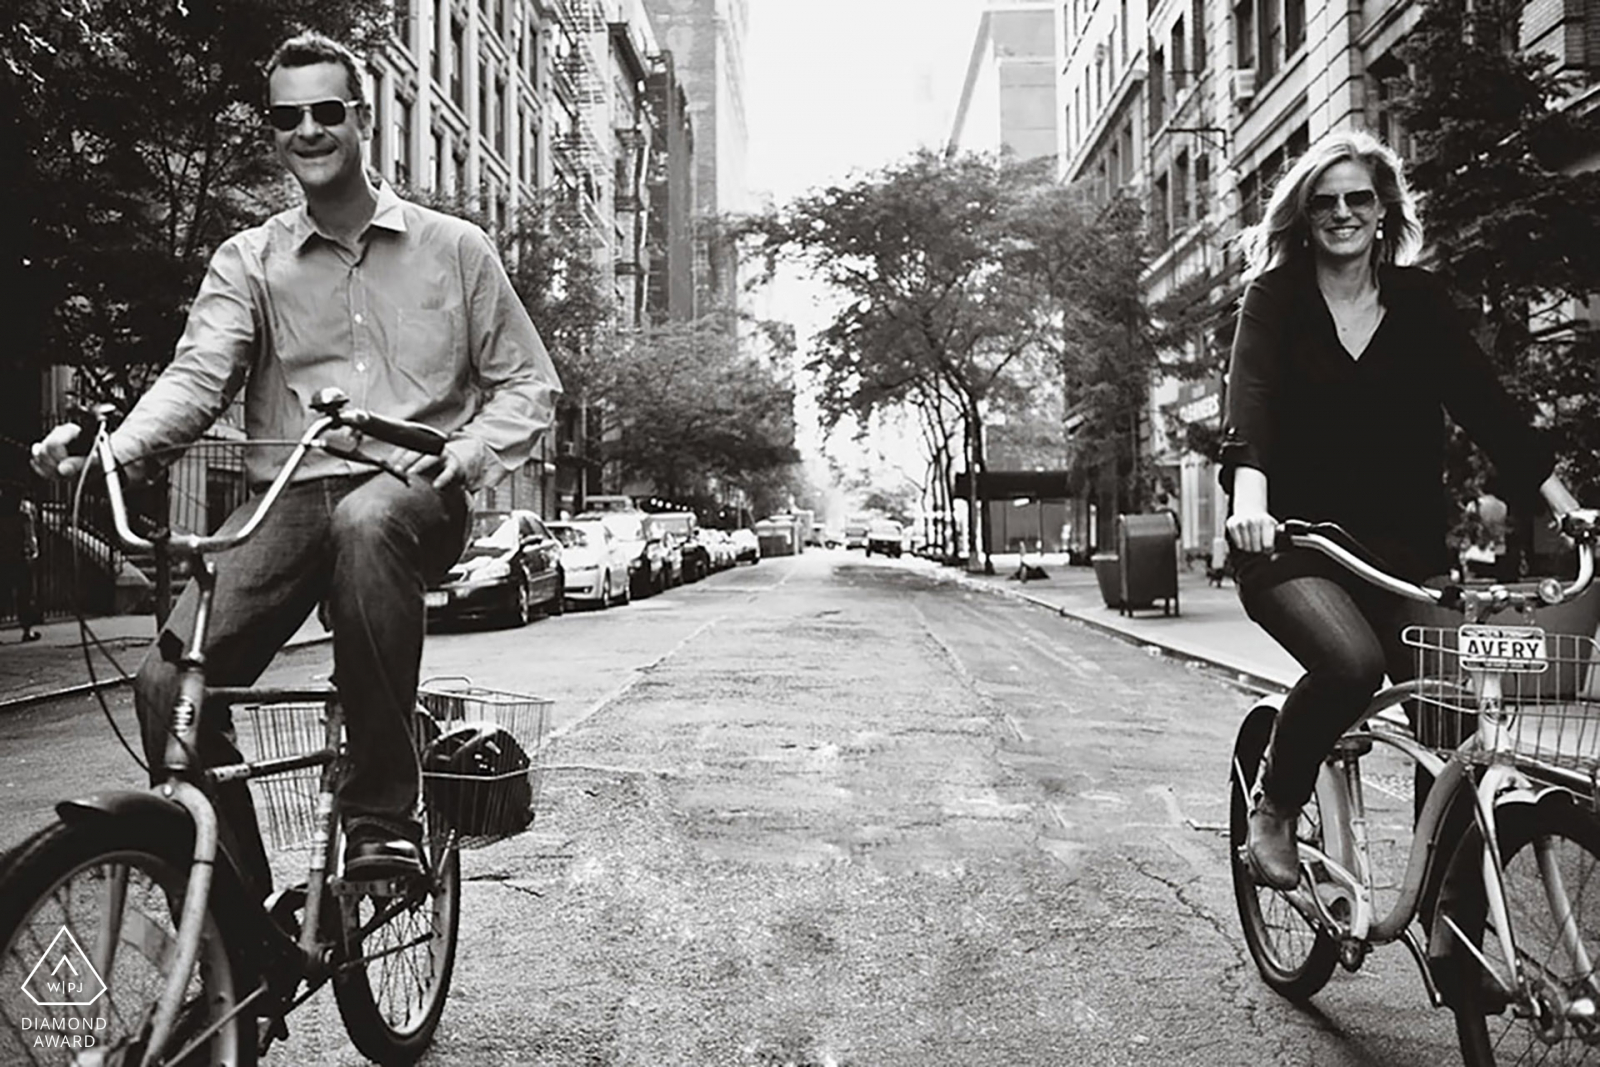 bike ride engagement photo by casey fatchett